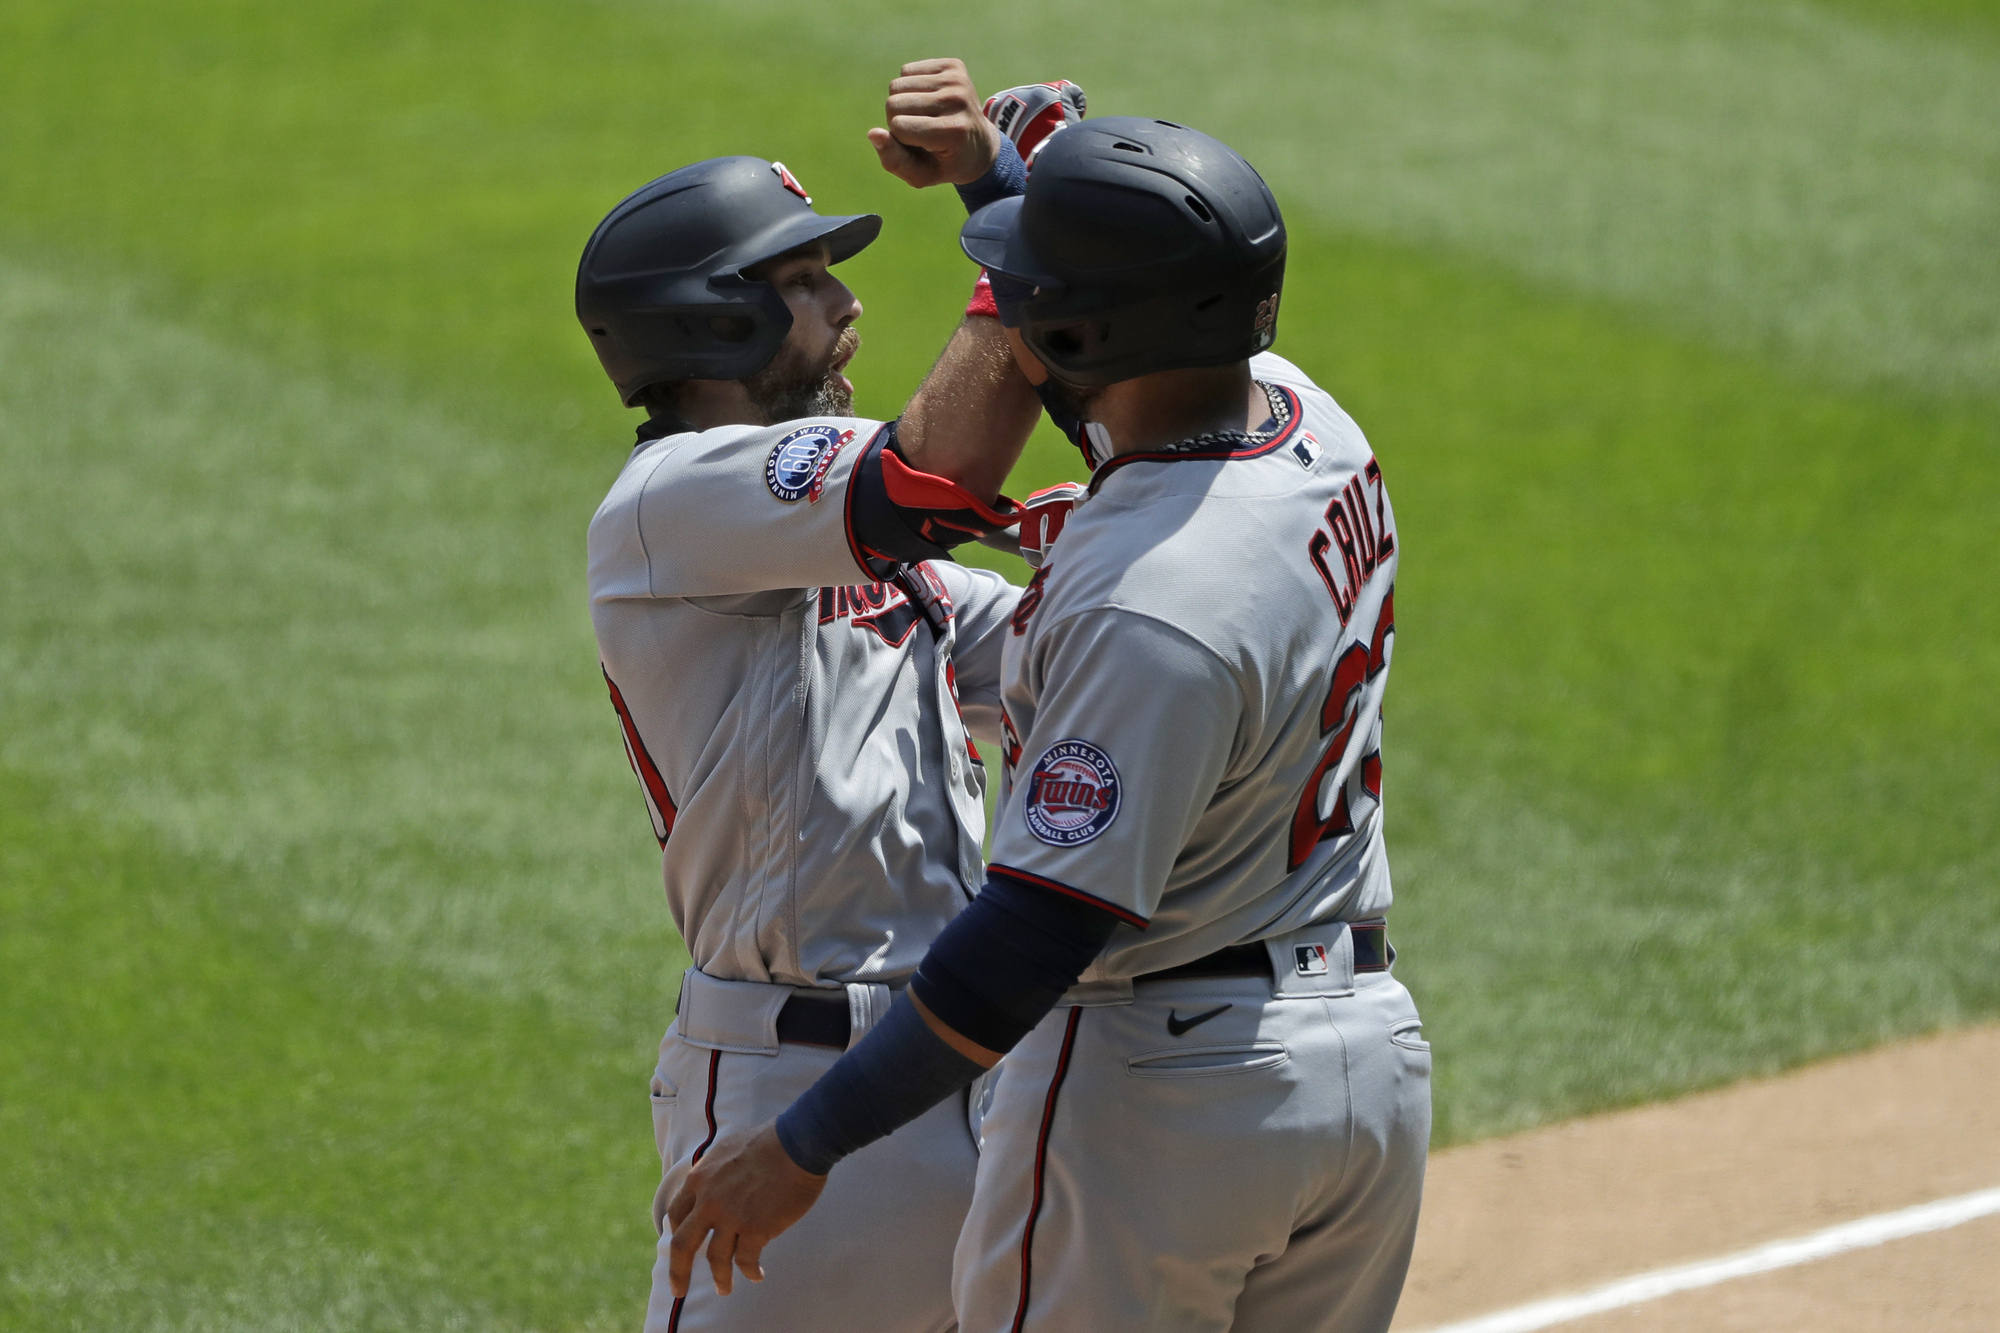 Cruz drives in seven, Cave hits grand slam as Twins smash White Sox 14-2